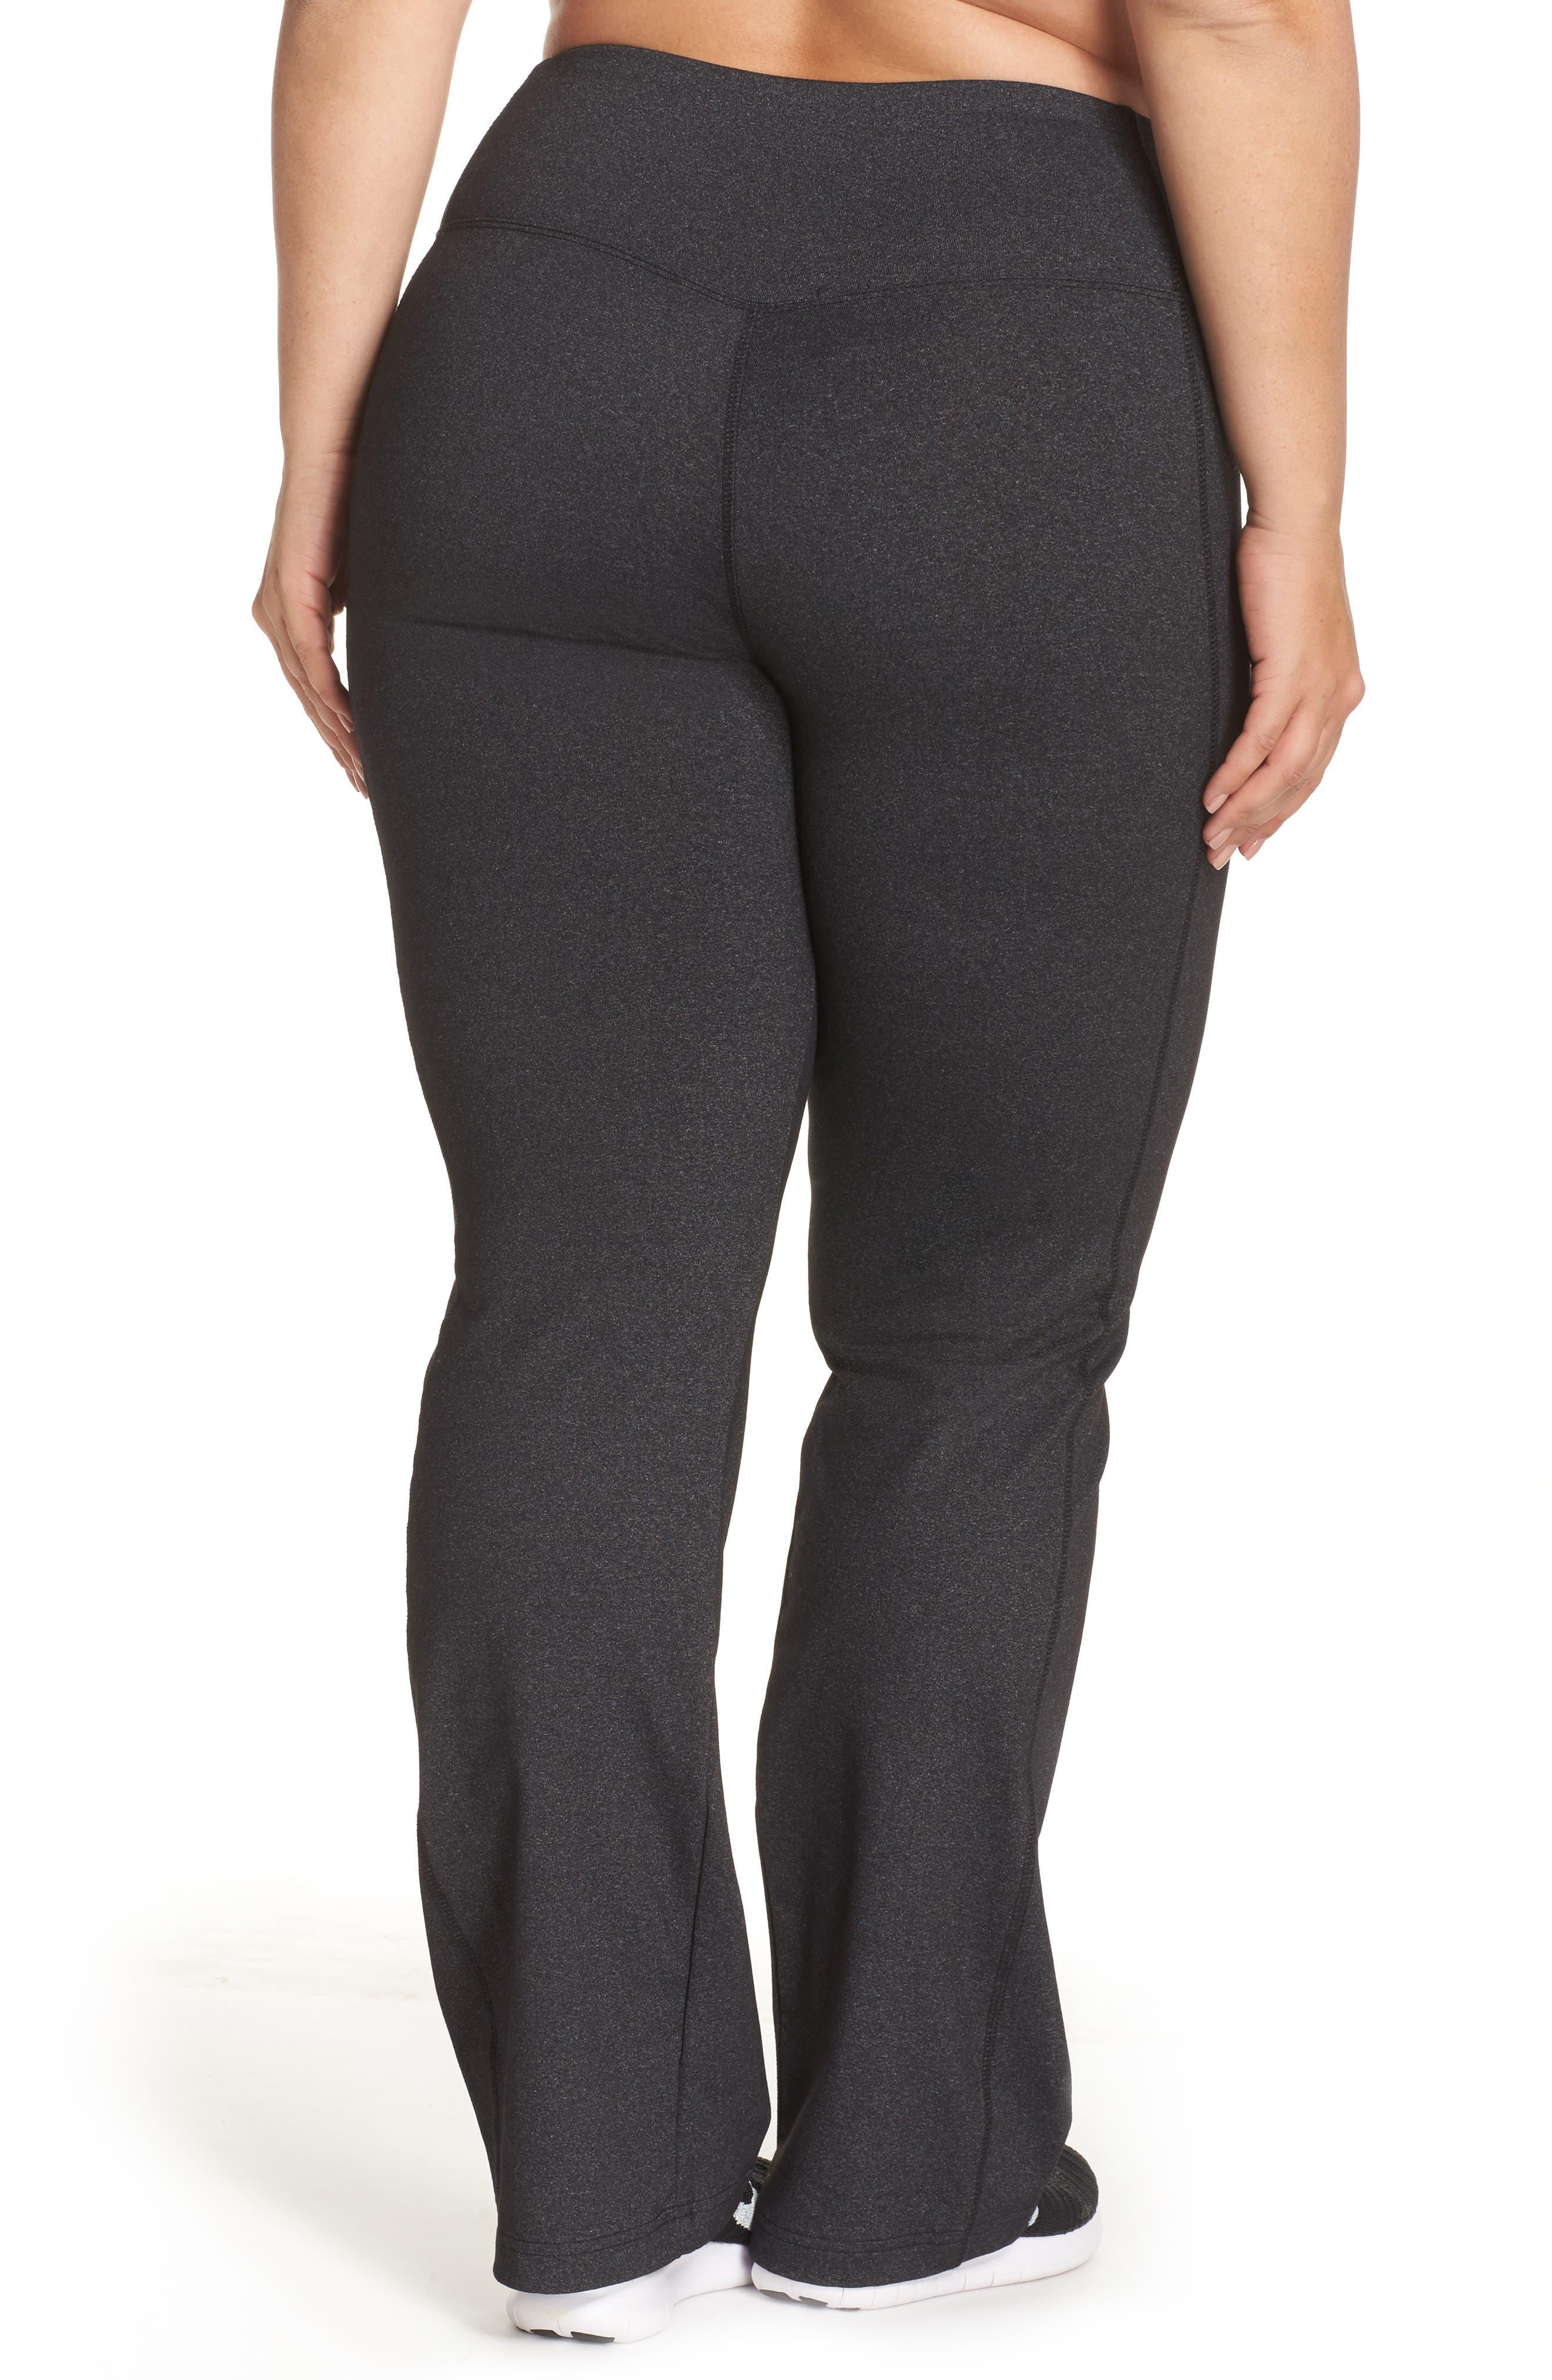 Alternate Image 2  - Marika Curves High Rise Control Top Bootcut Pants